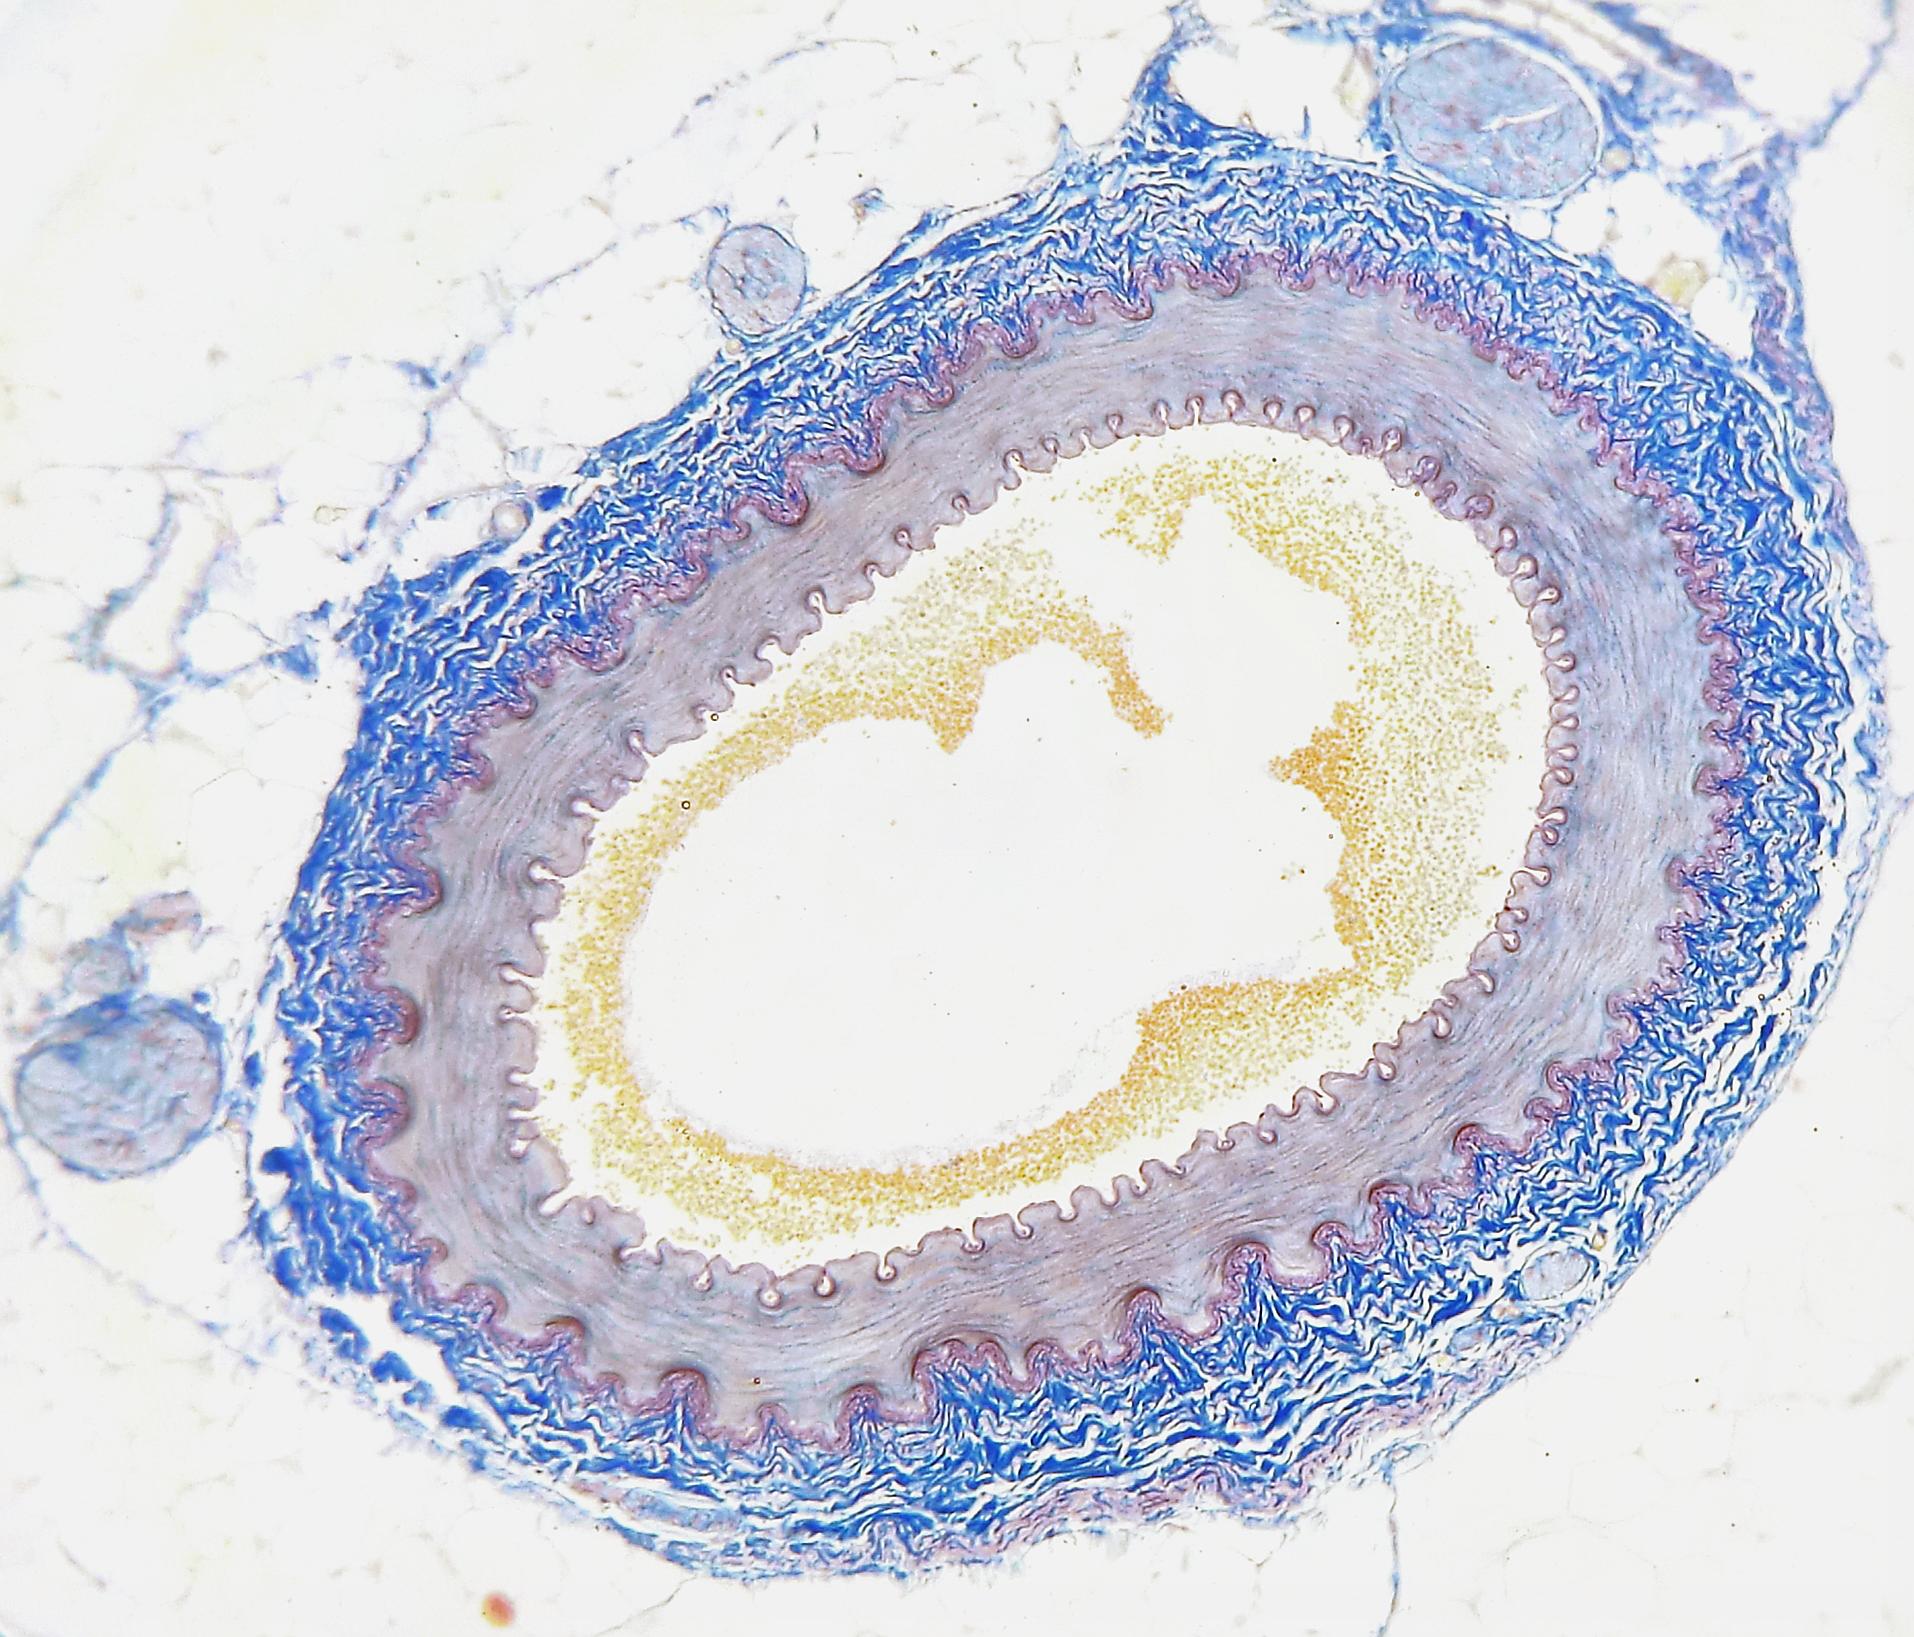 14.4.8 Artery Cross Section